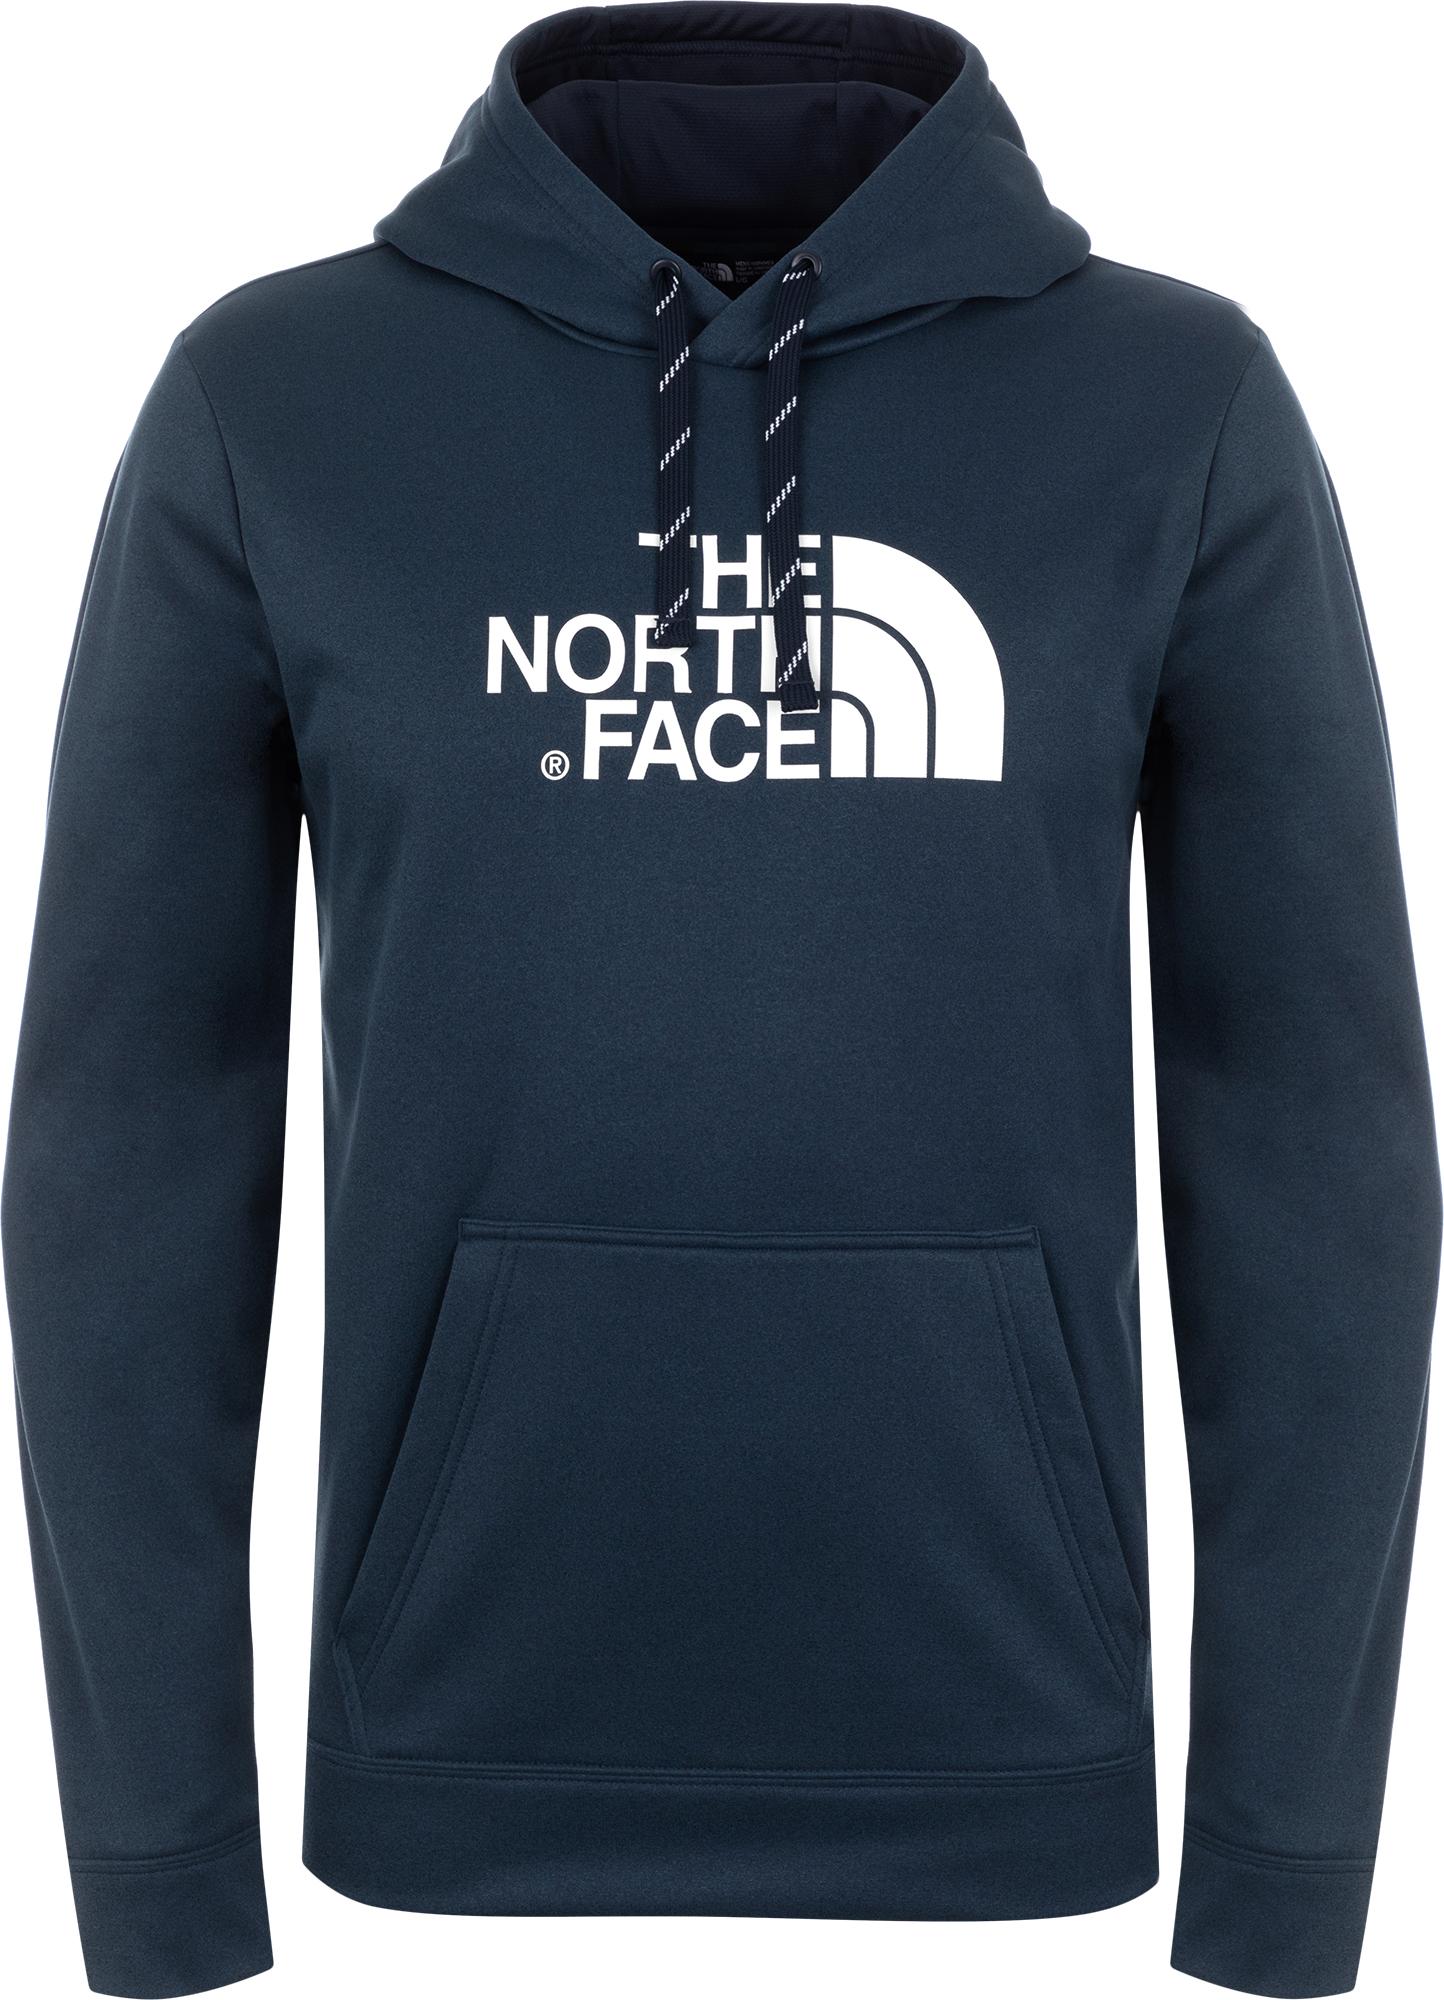 The North Face Джемпер мужской The North Face Surgent, размер 52 цена и фото